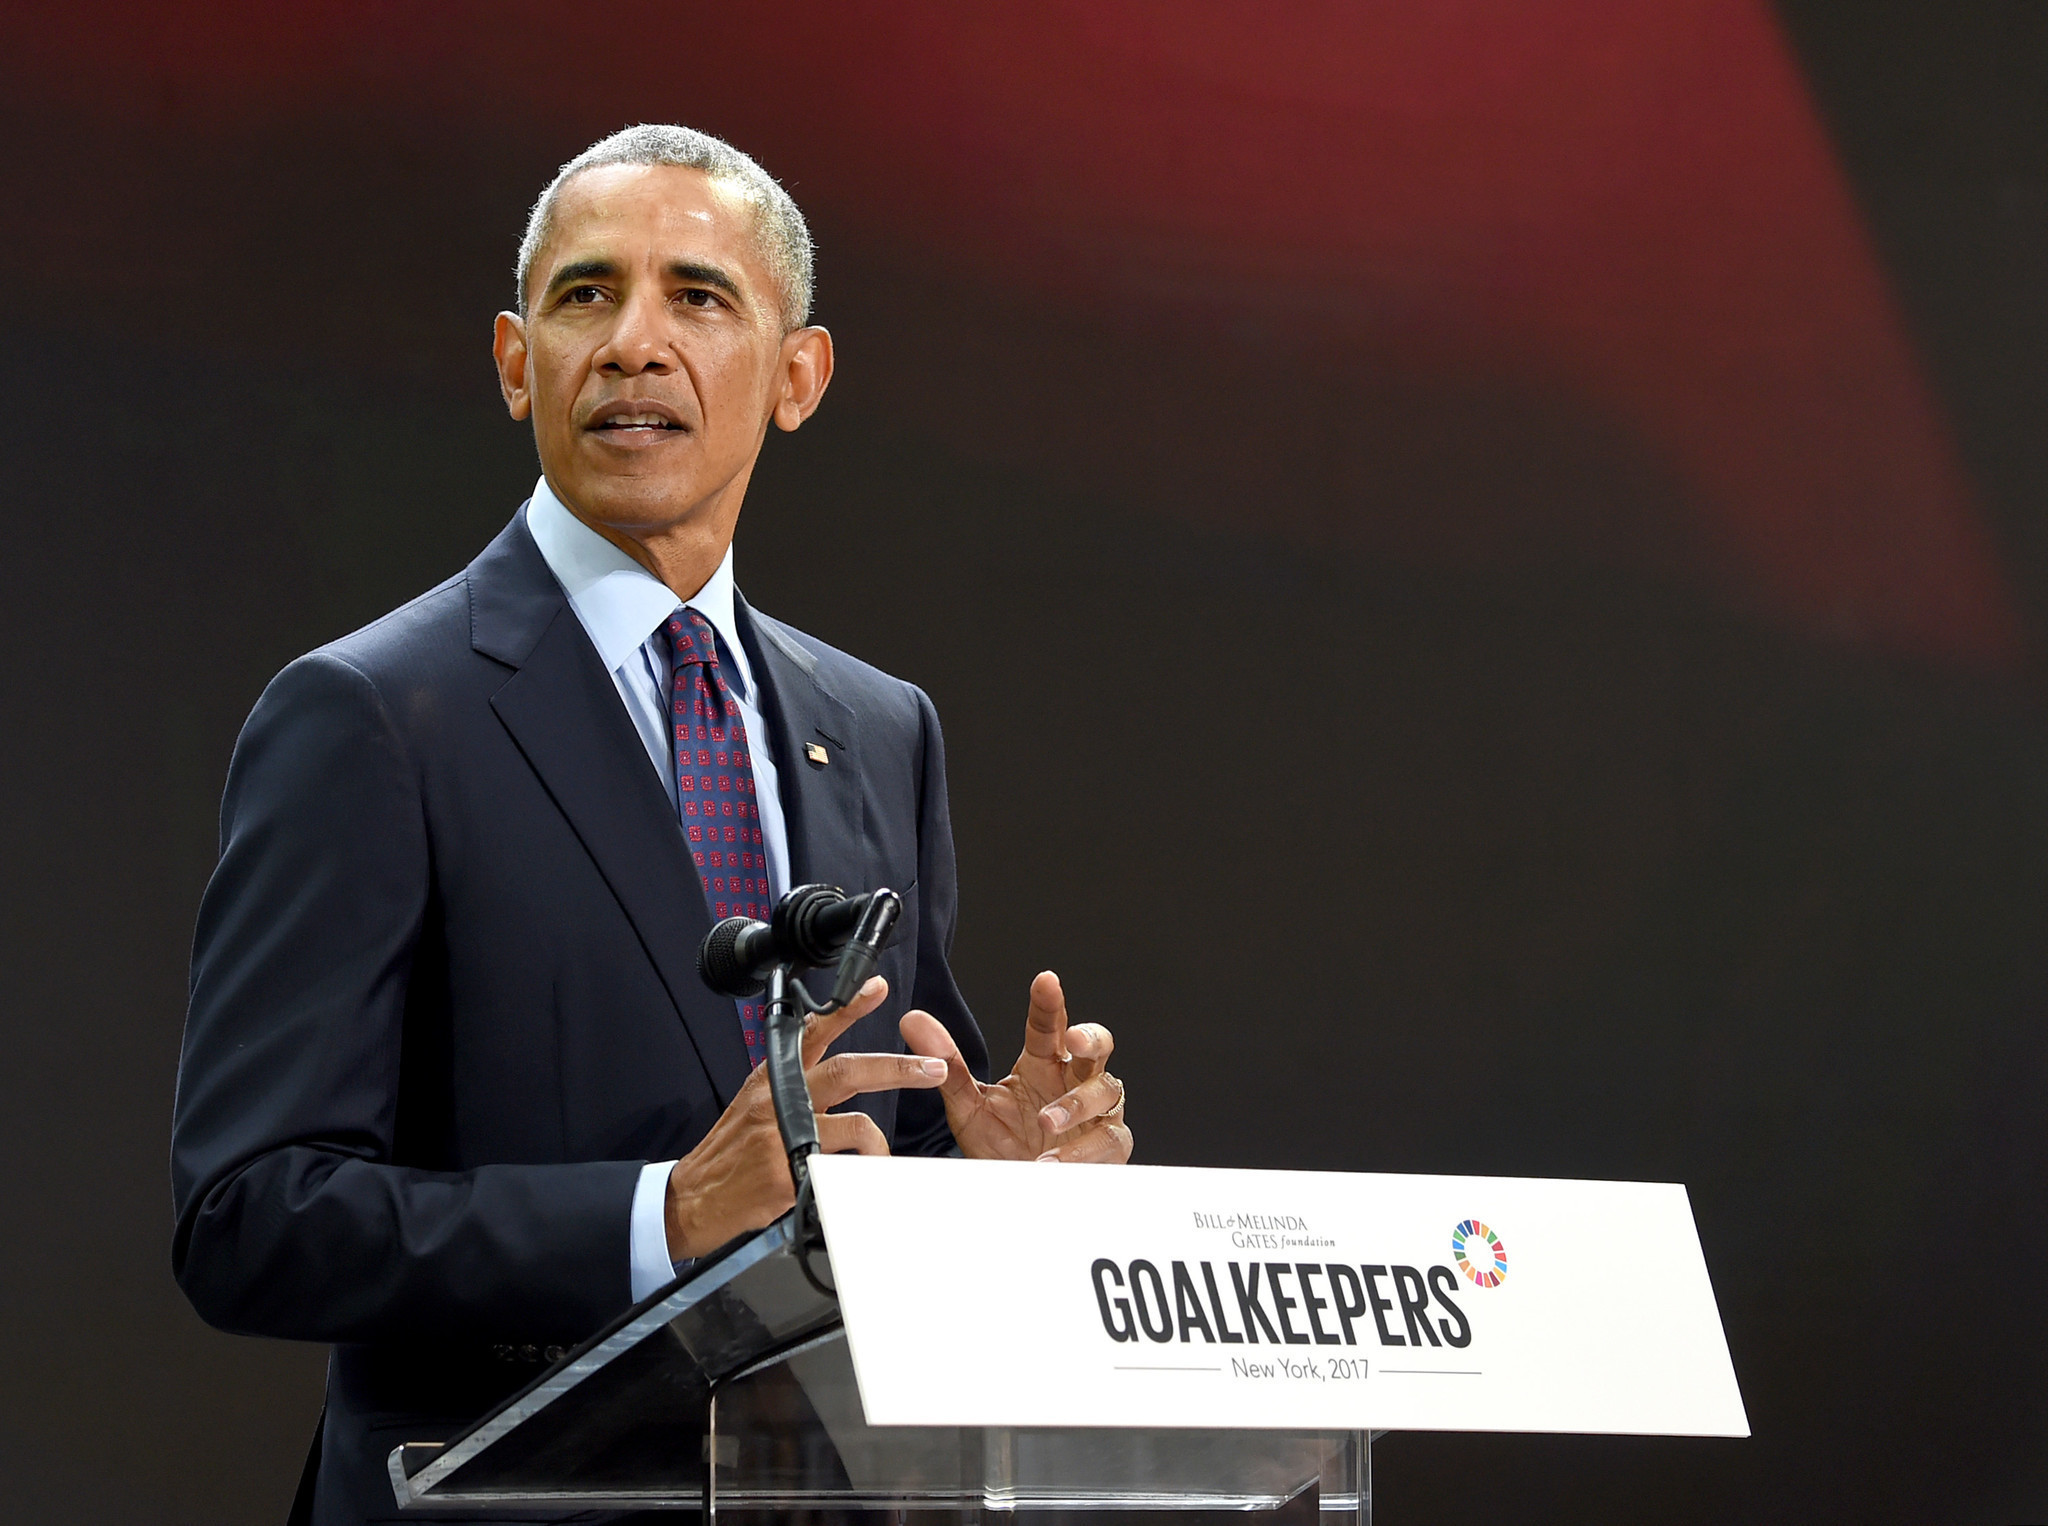 Barack Obama's Health Care Reform Bill Explained